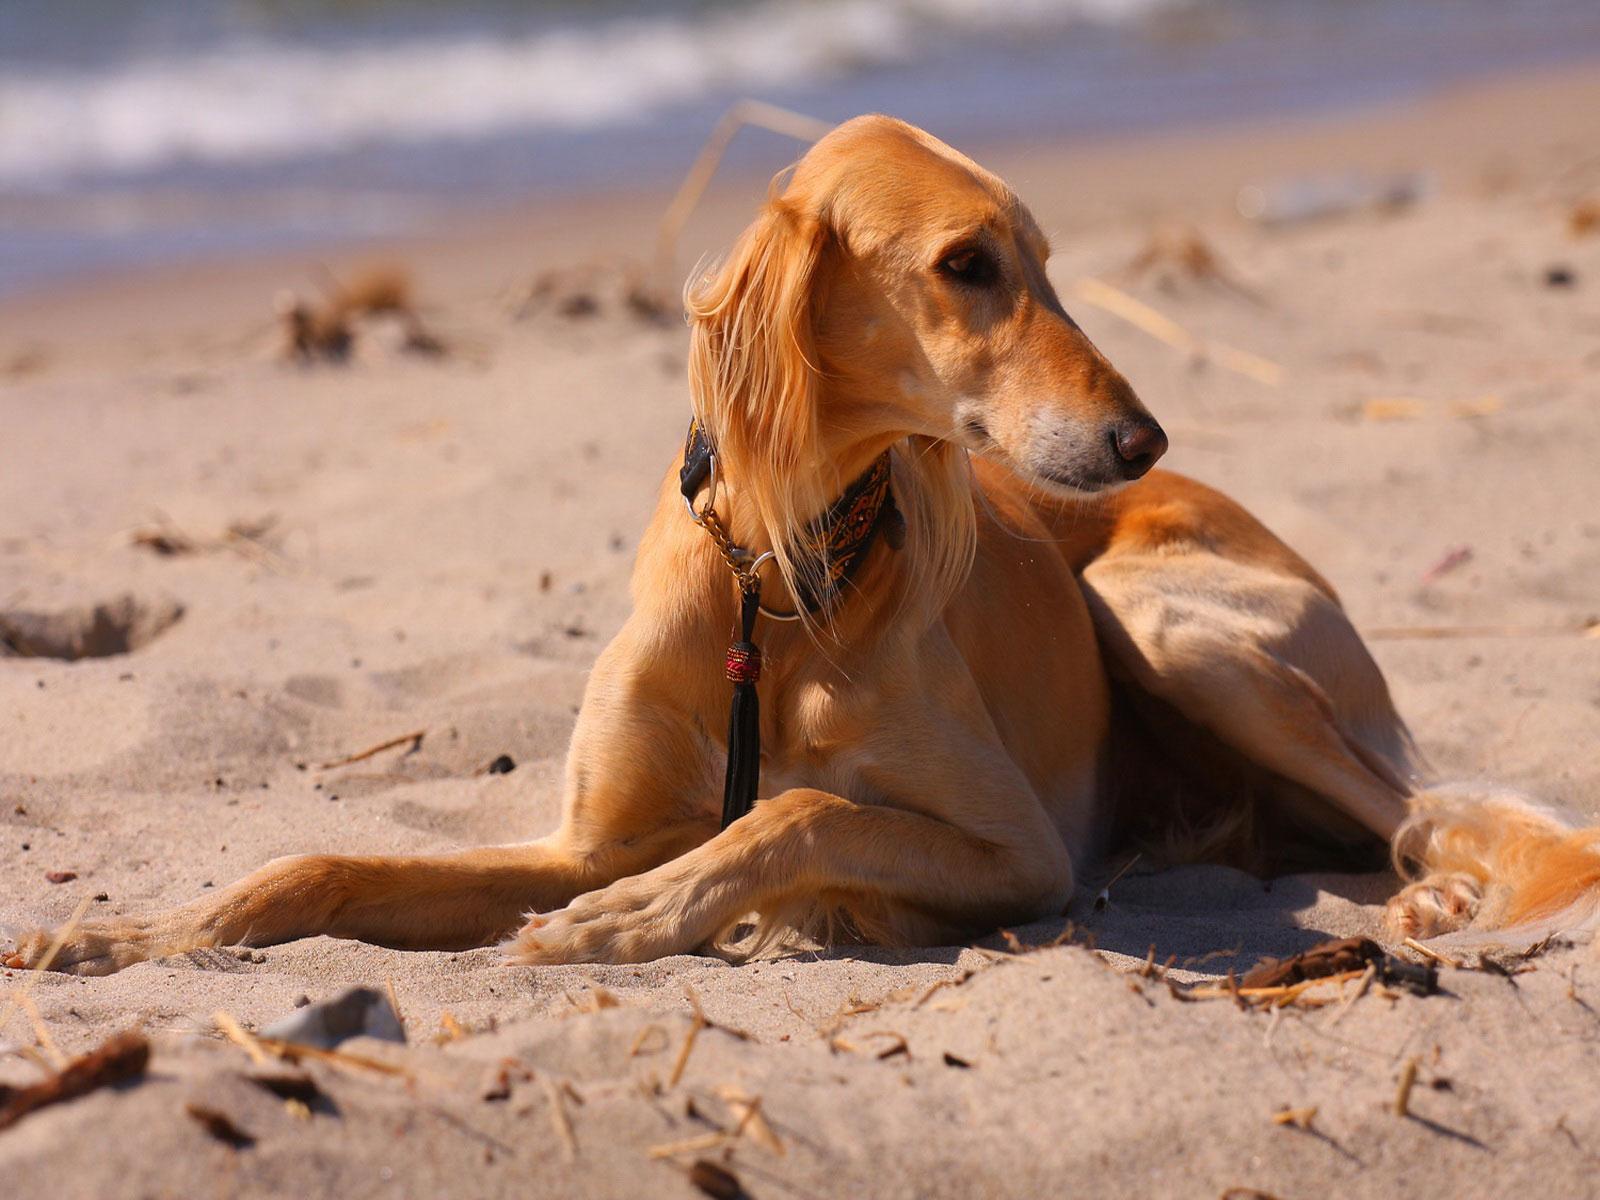 Saluki dog on the sand wallpaper